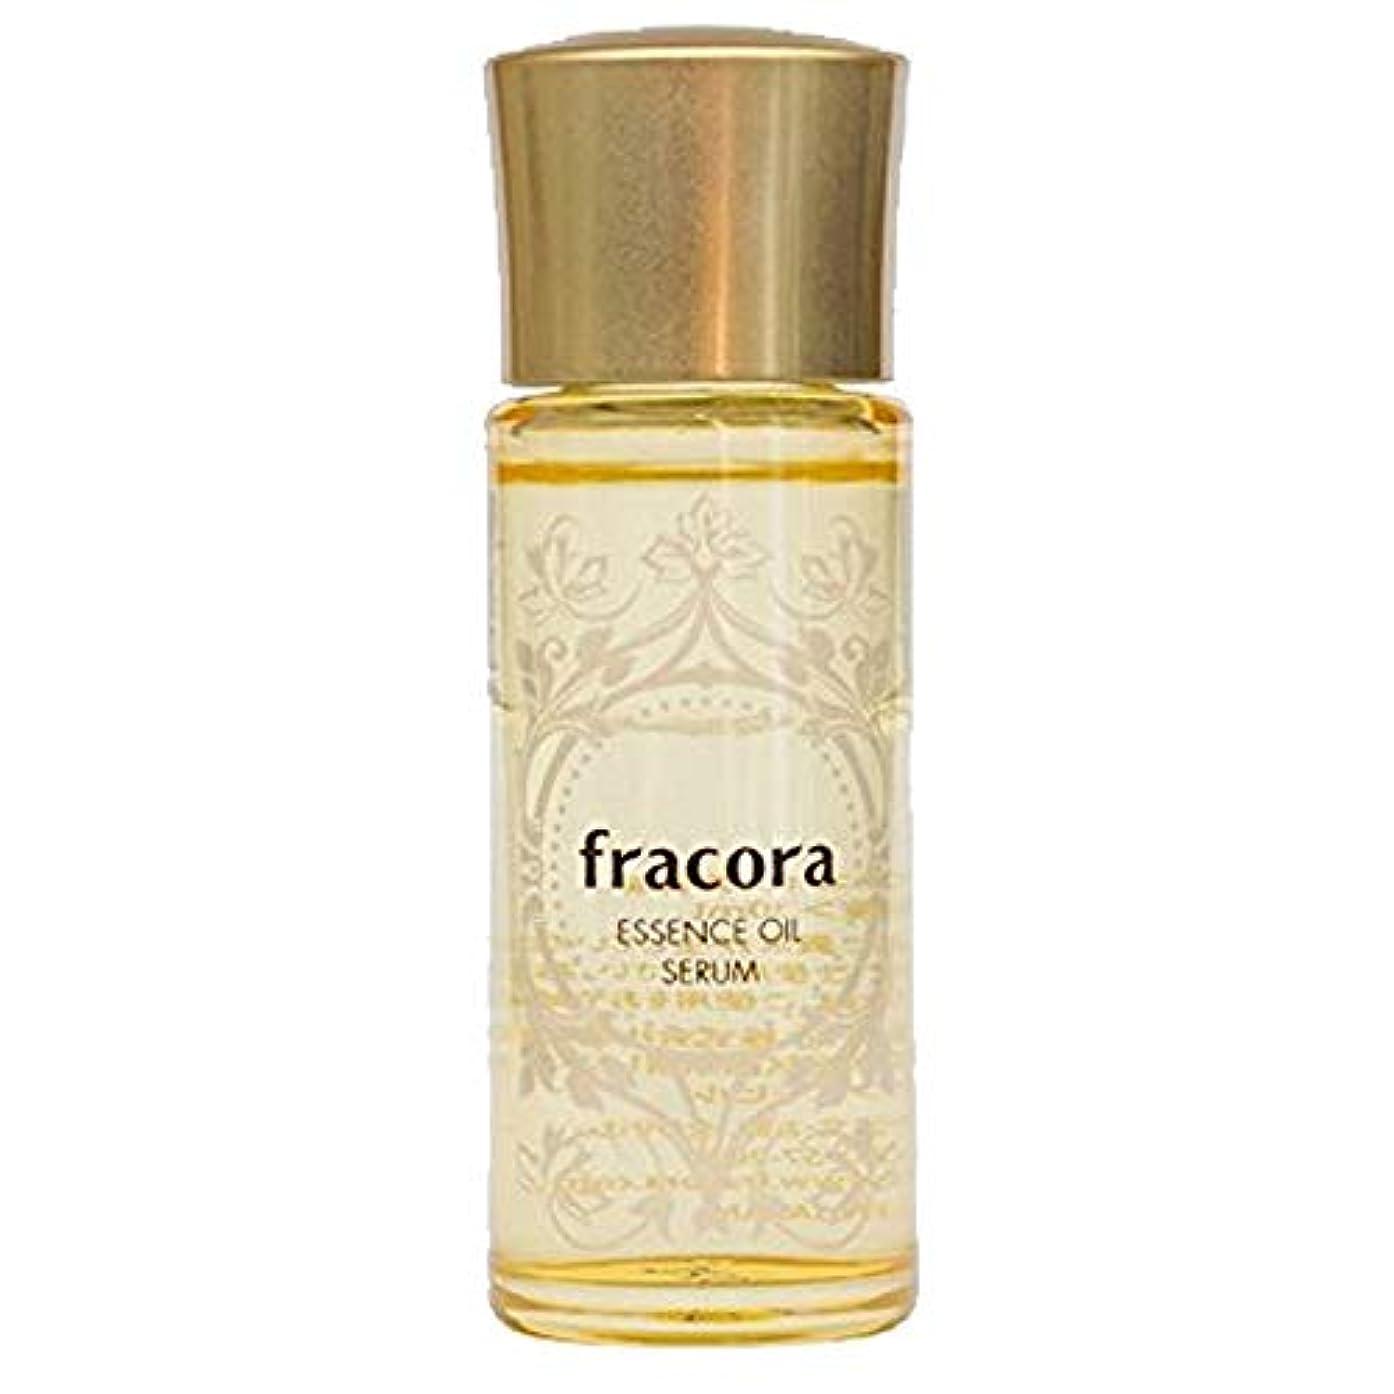 fracora(フラコラ) エッセンスオイル美容液 30mL